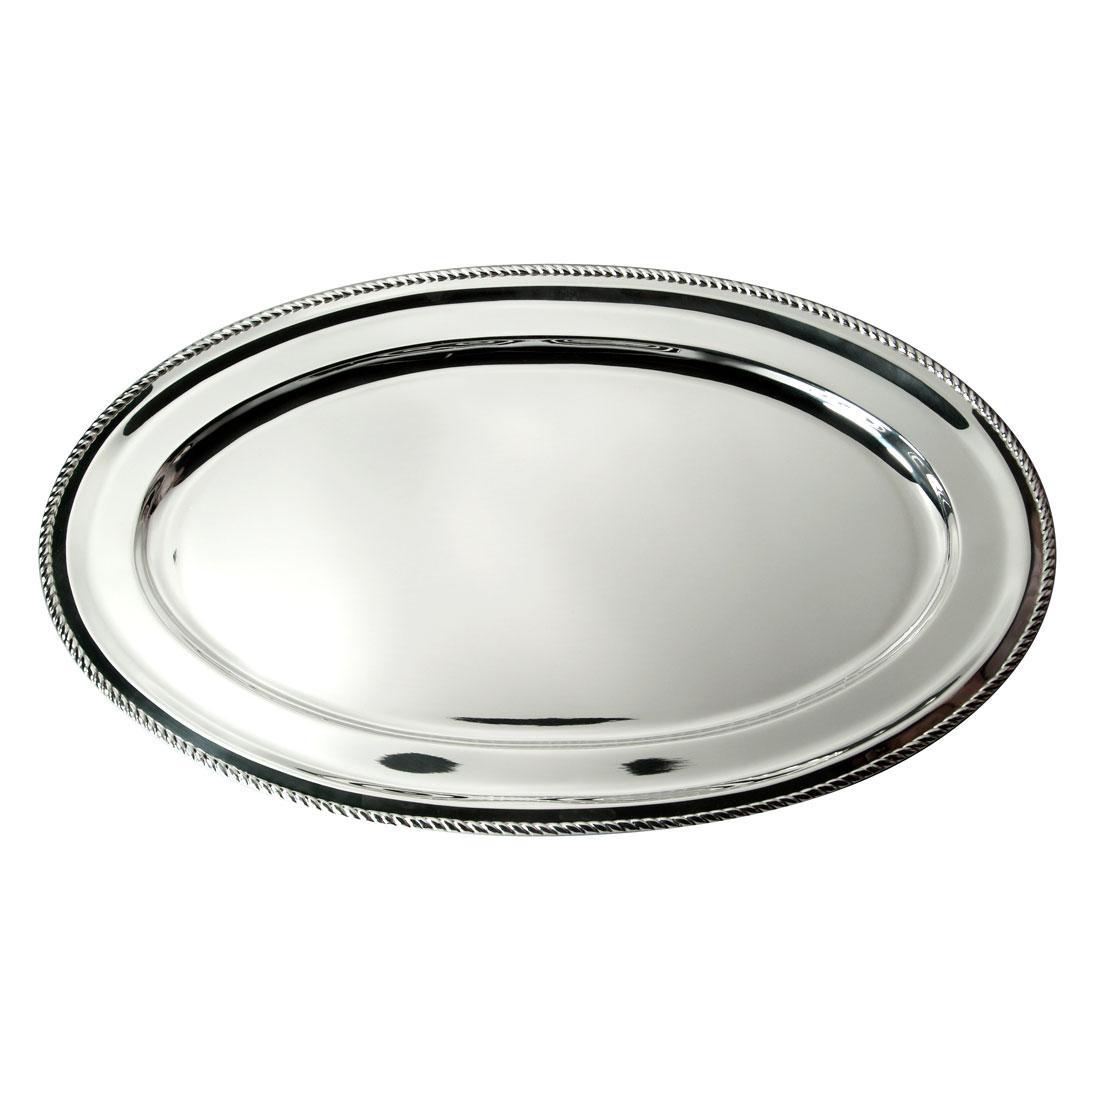 Orfevra 28 Inch Silver Plated Turkey Platter